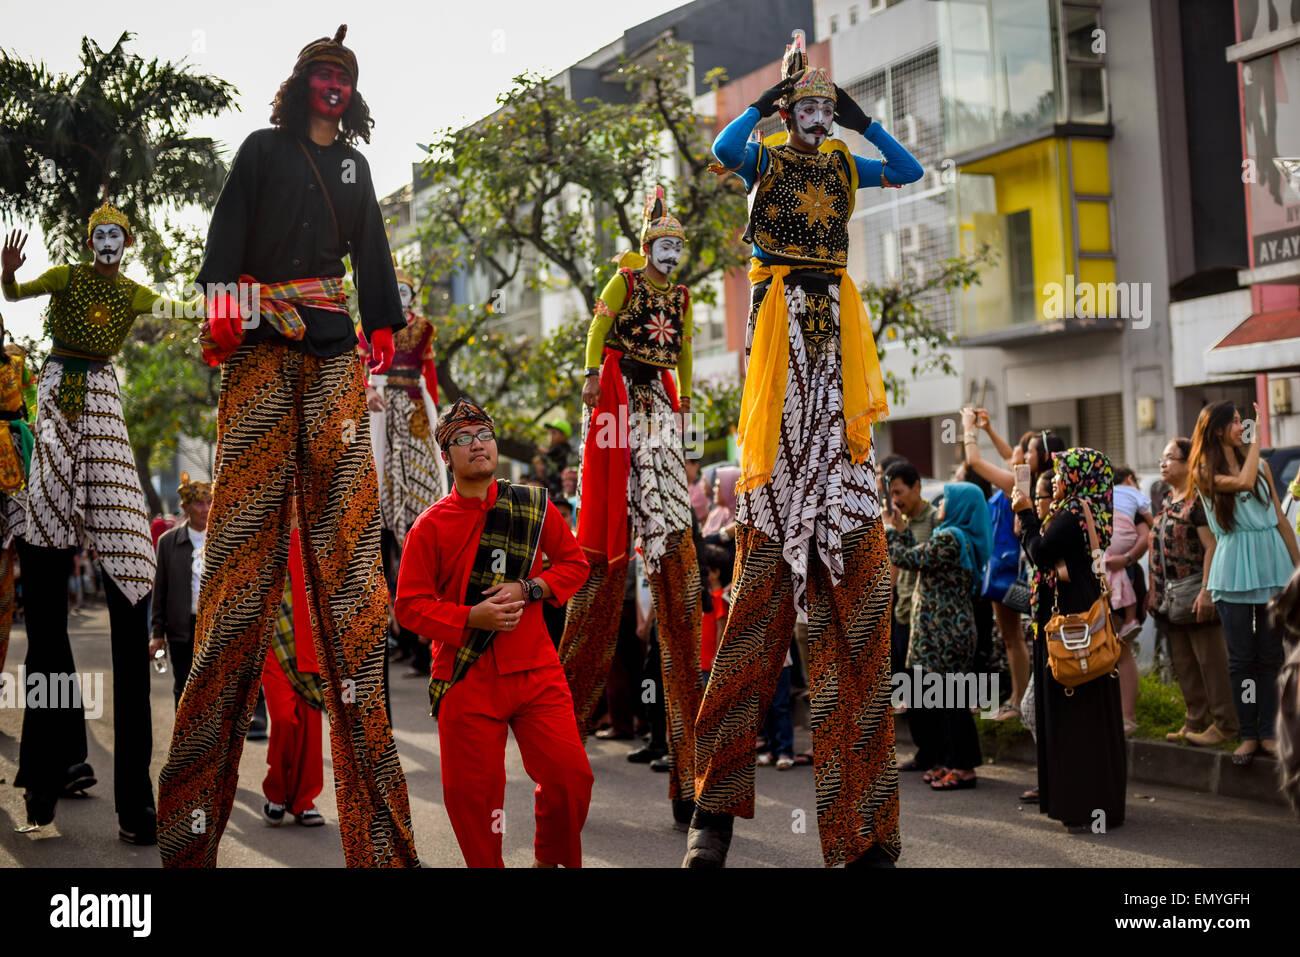 Giant Mahabharata (Sanskrit epic) characters in lantern festival in Bandung, Indonesia. - Stock Image